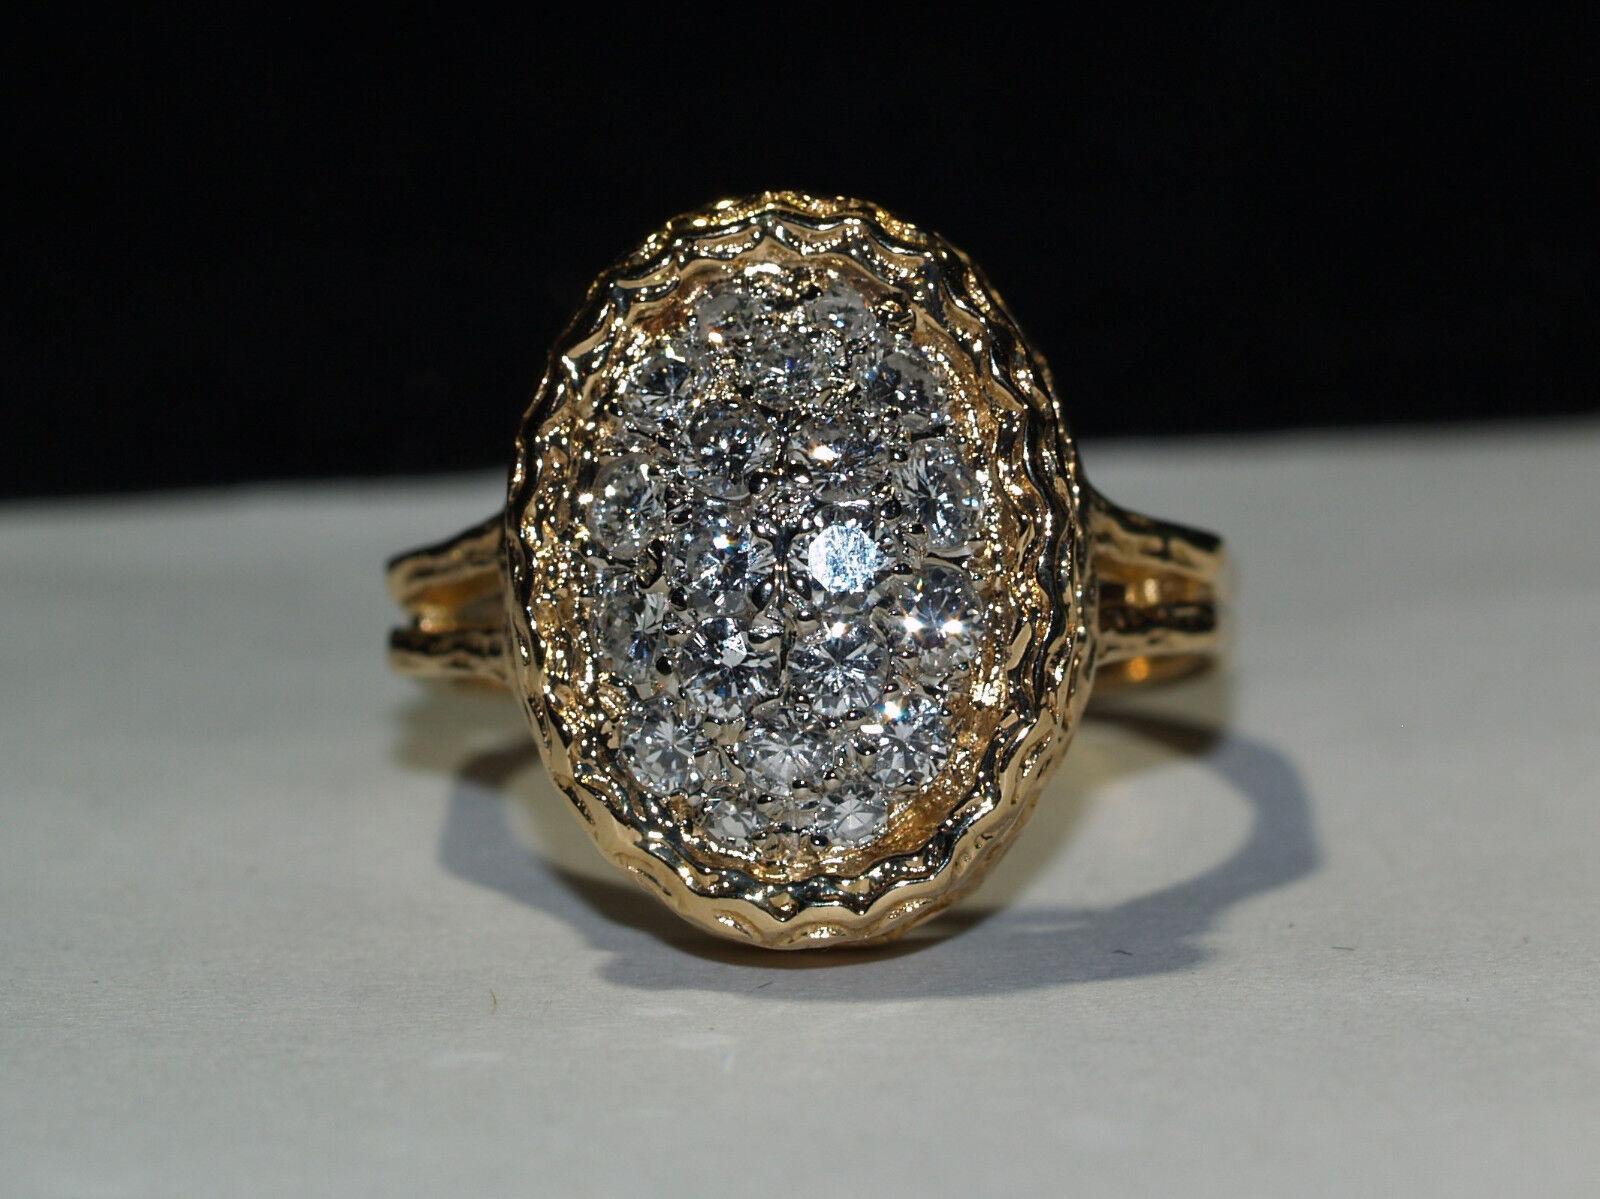 Beaitiful 14-k Yellow gold Pave Oval Diamond Ring